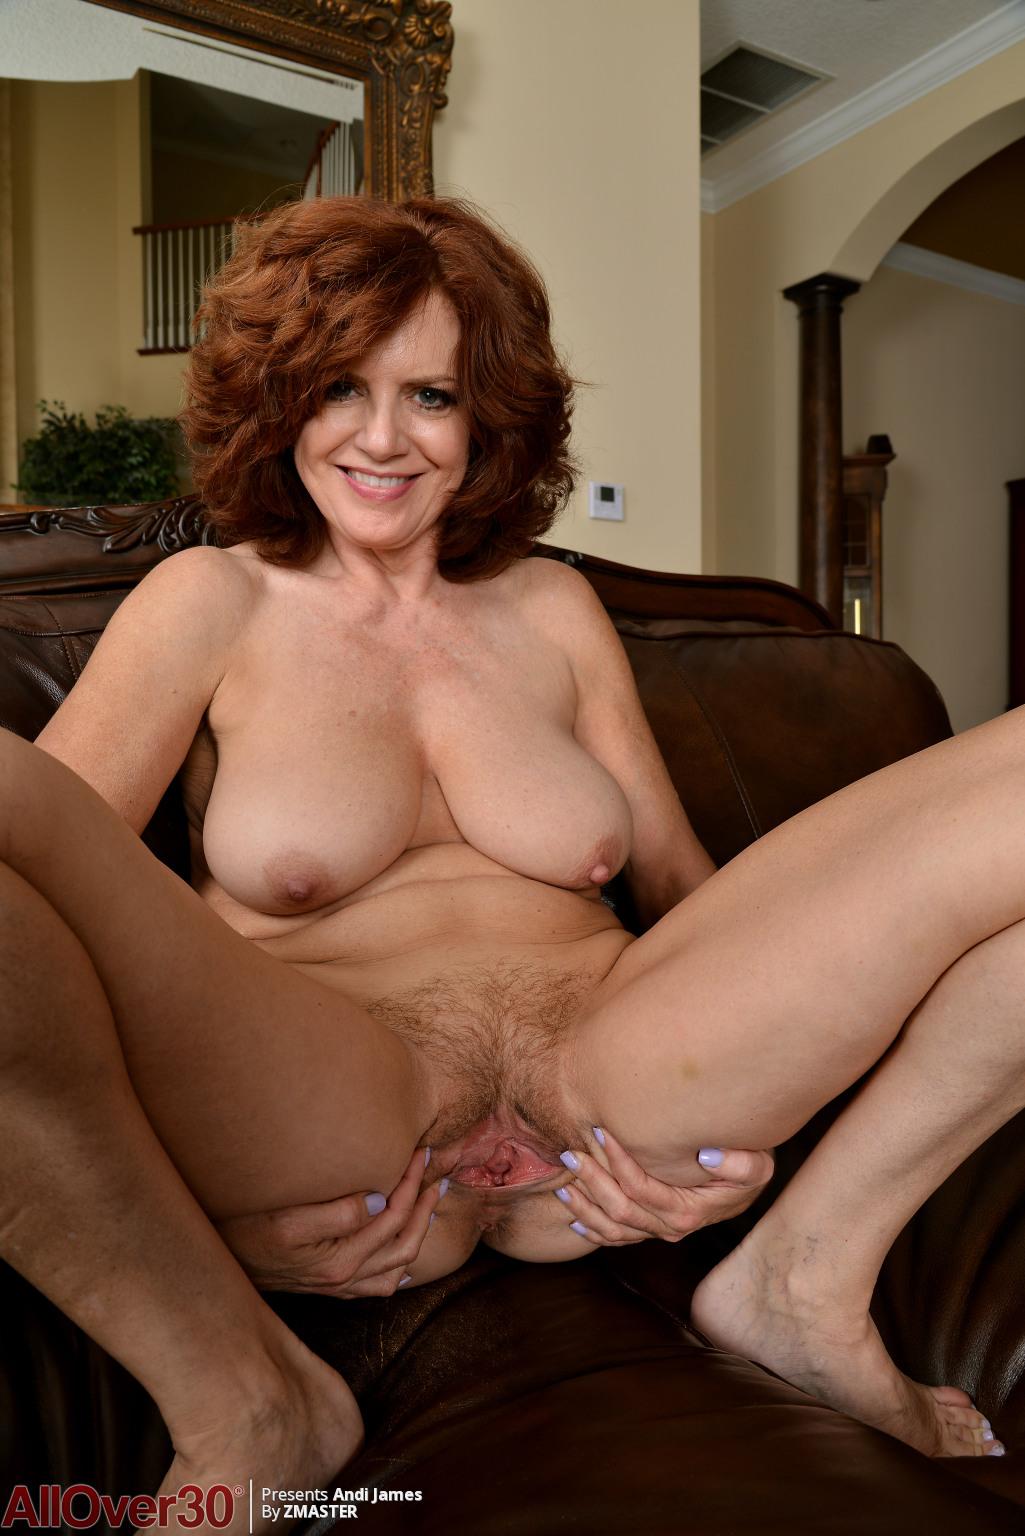 Womens erotica hot older guys